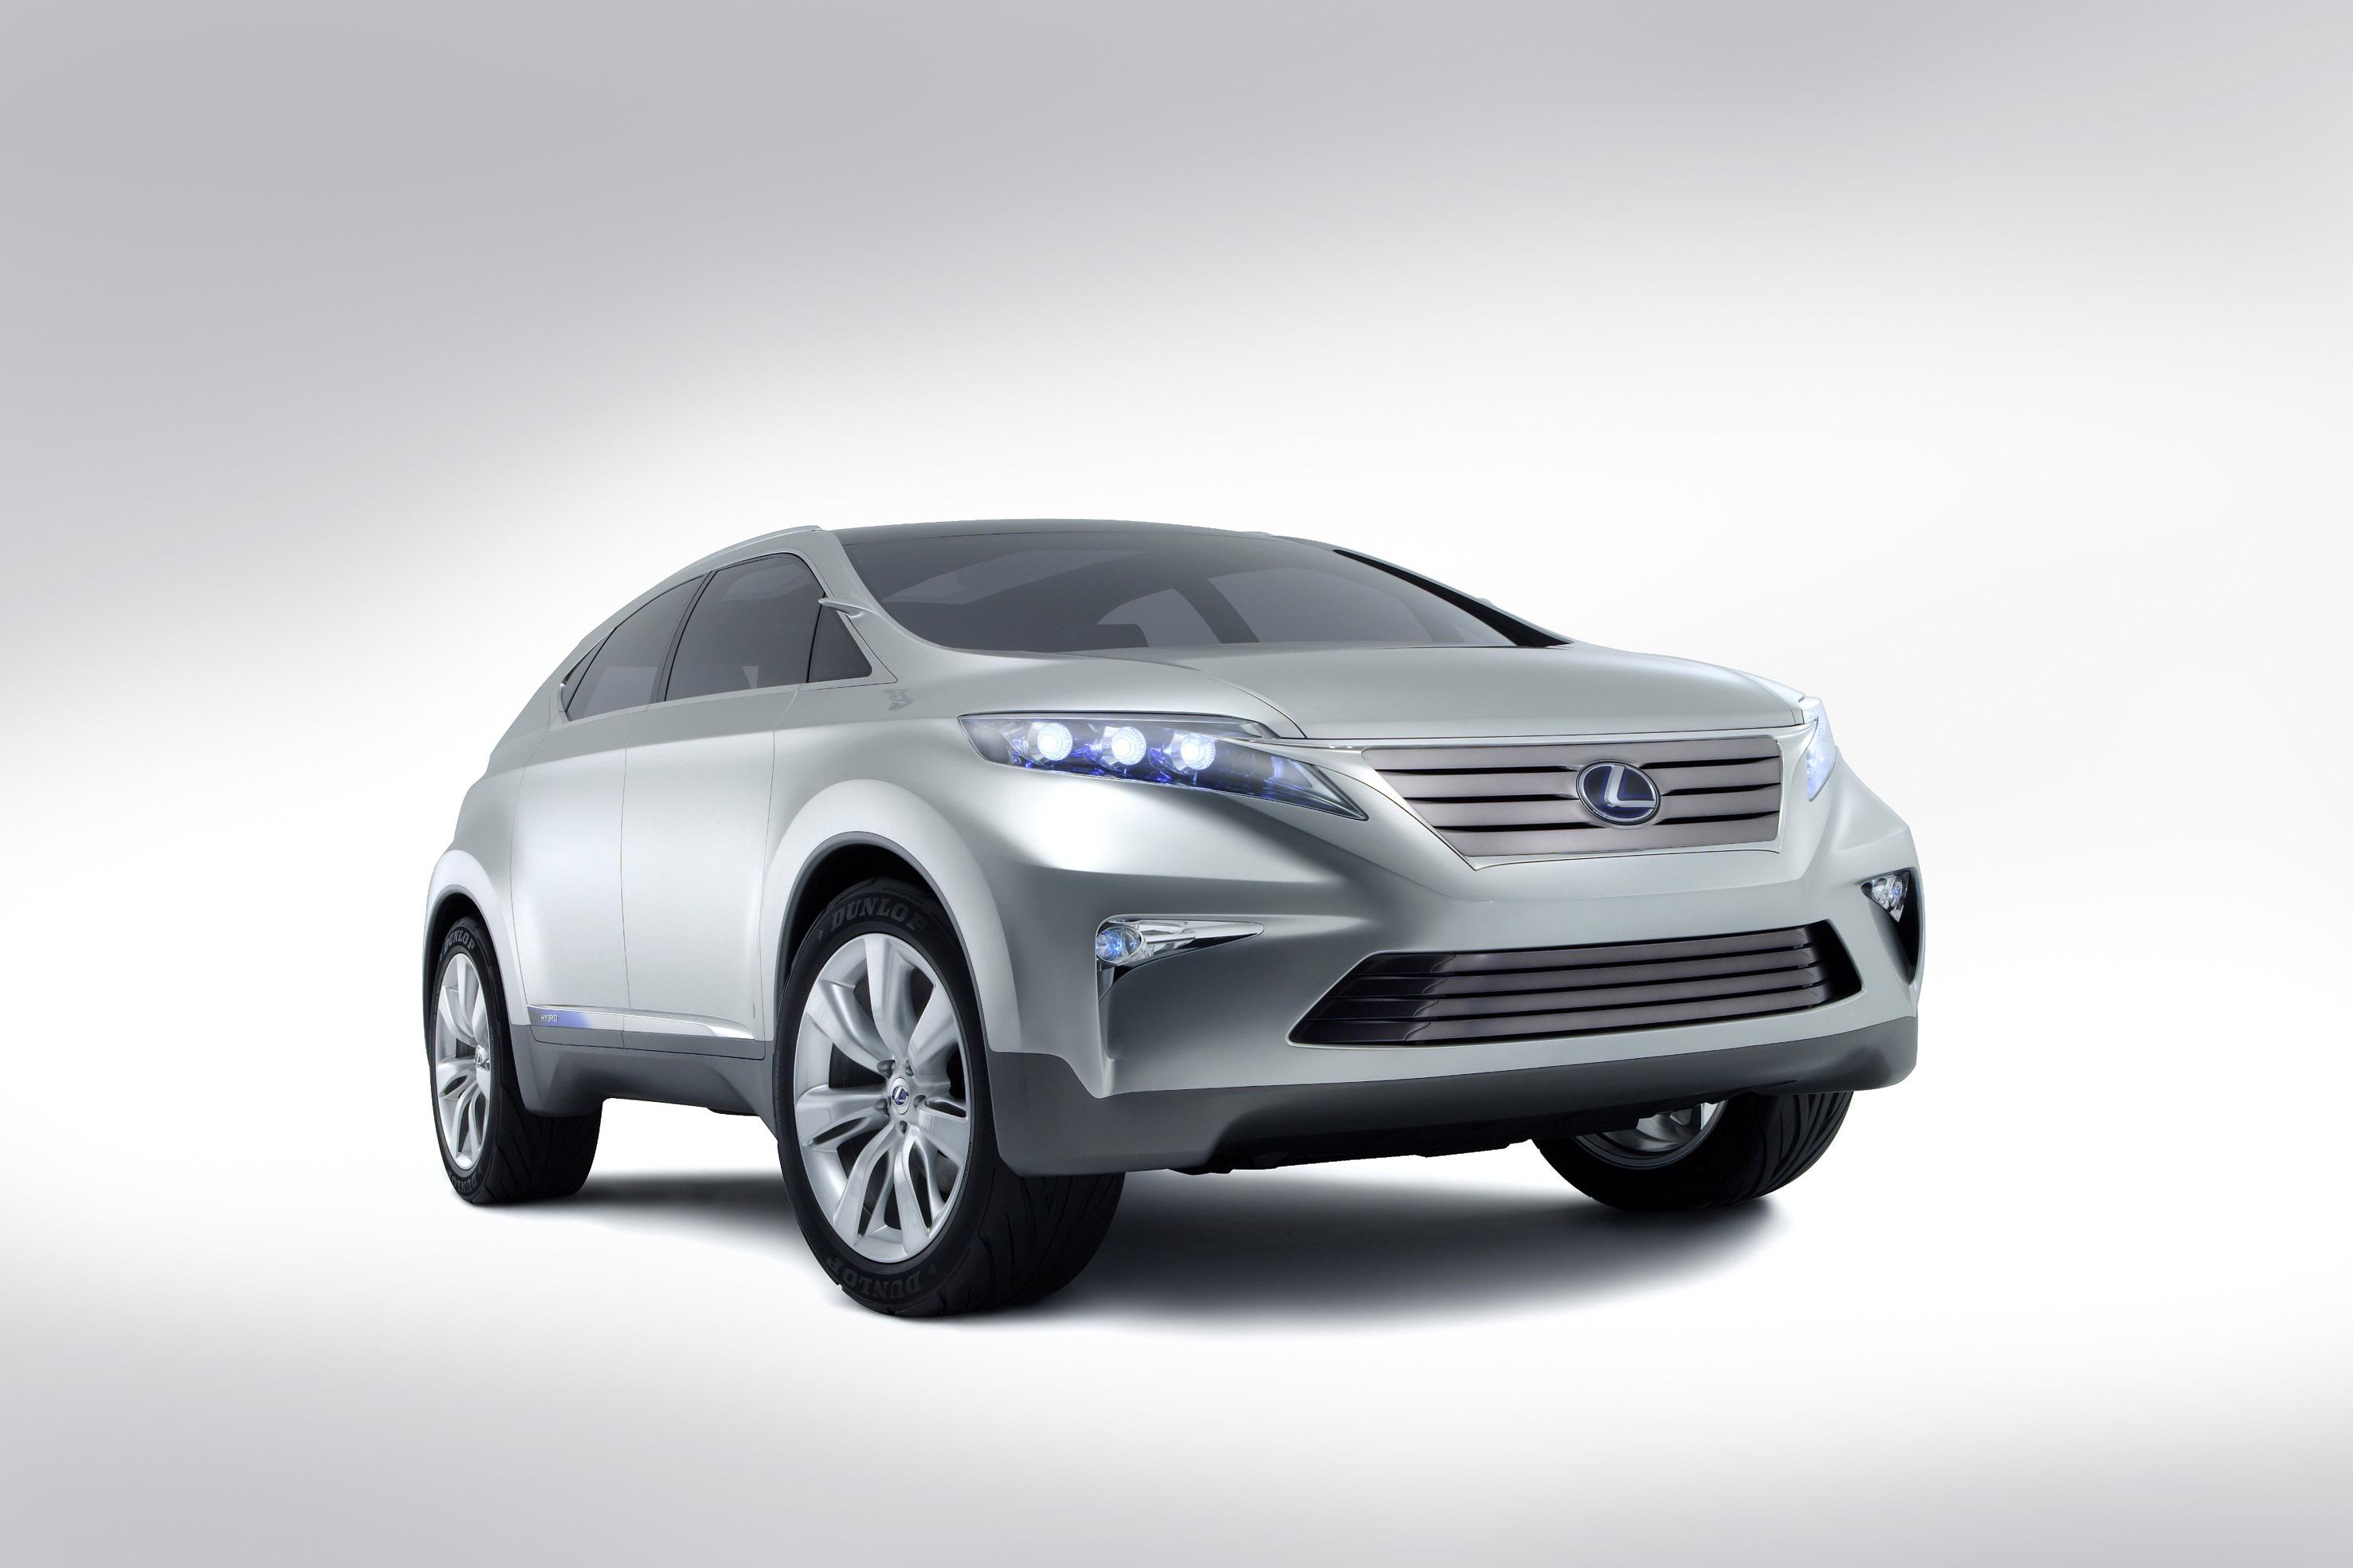 Lexus To Show Hybrid Concept At Australian International Motor 2007 Ford 3 0 V6 Engine Diagram Lf Xh Suv Of 4